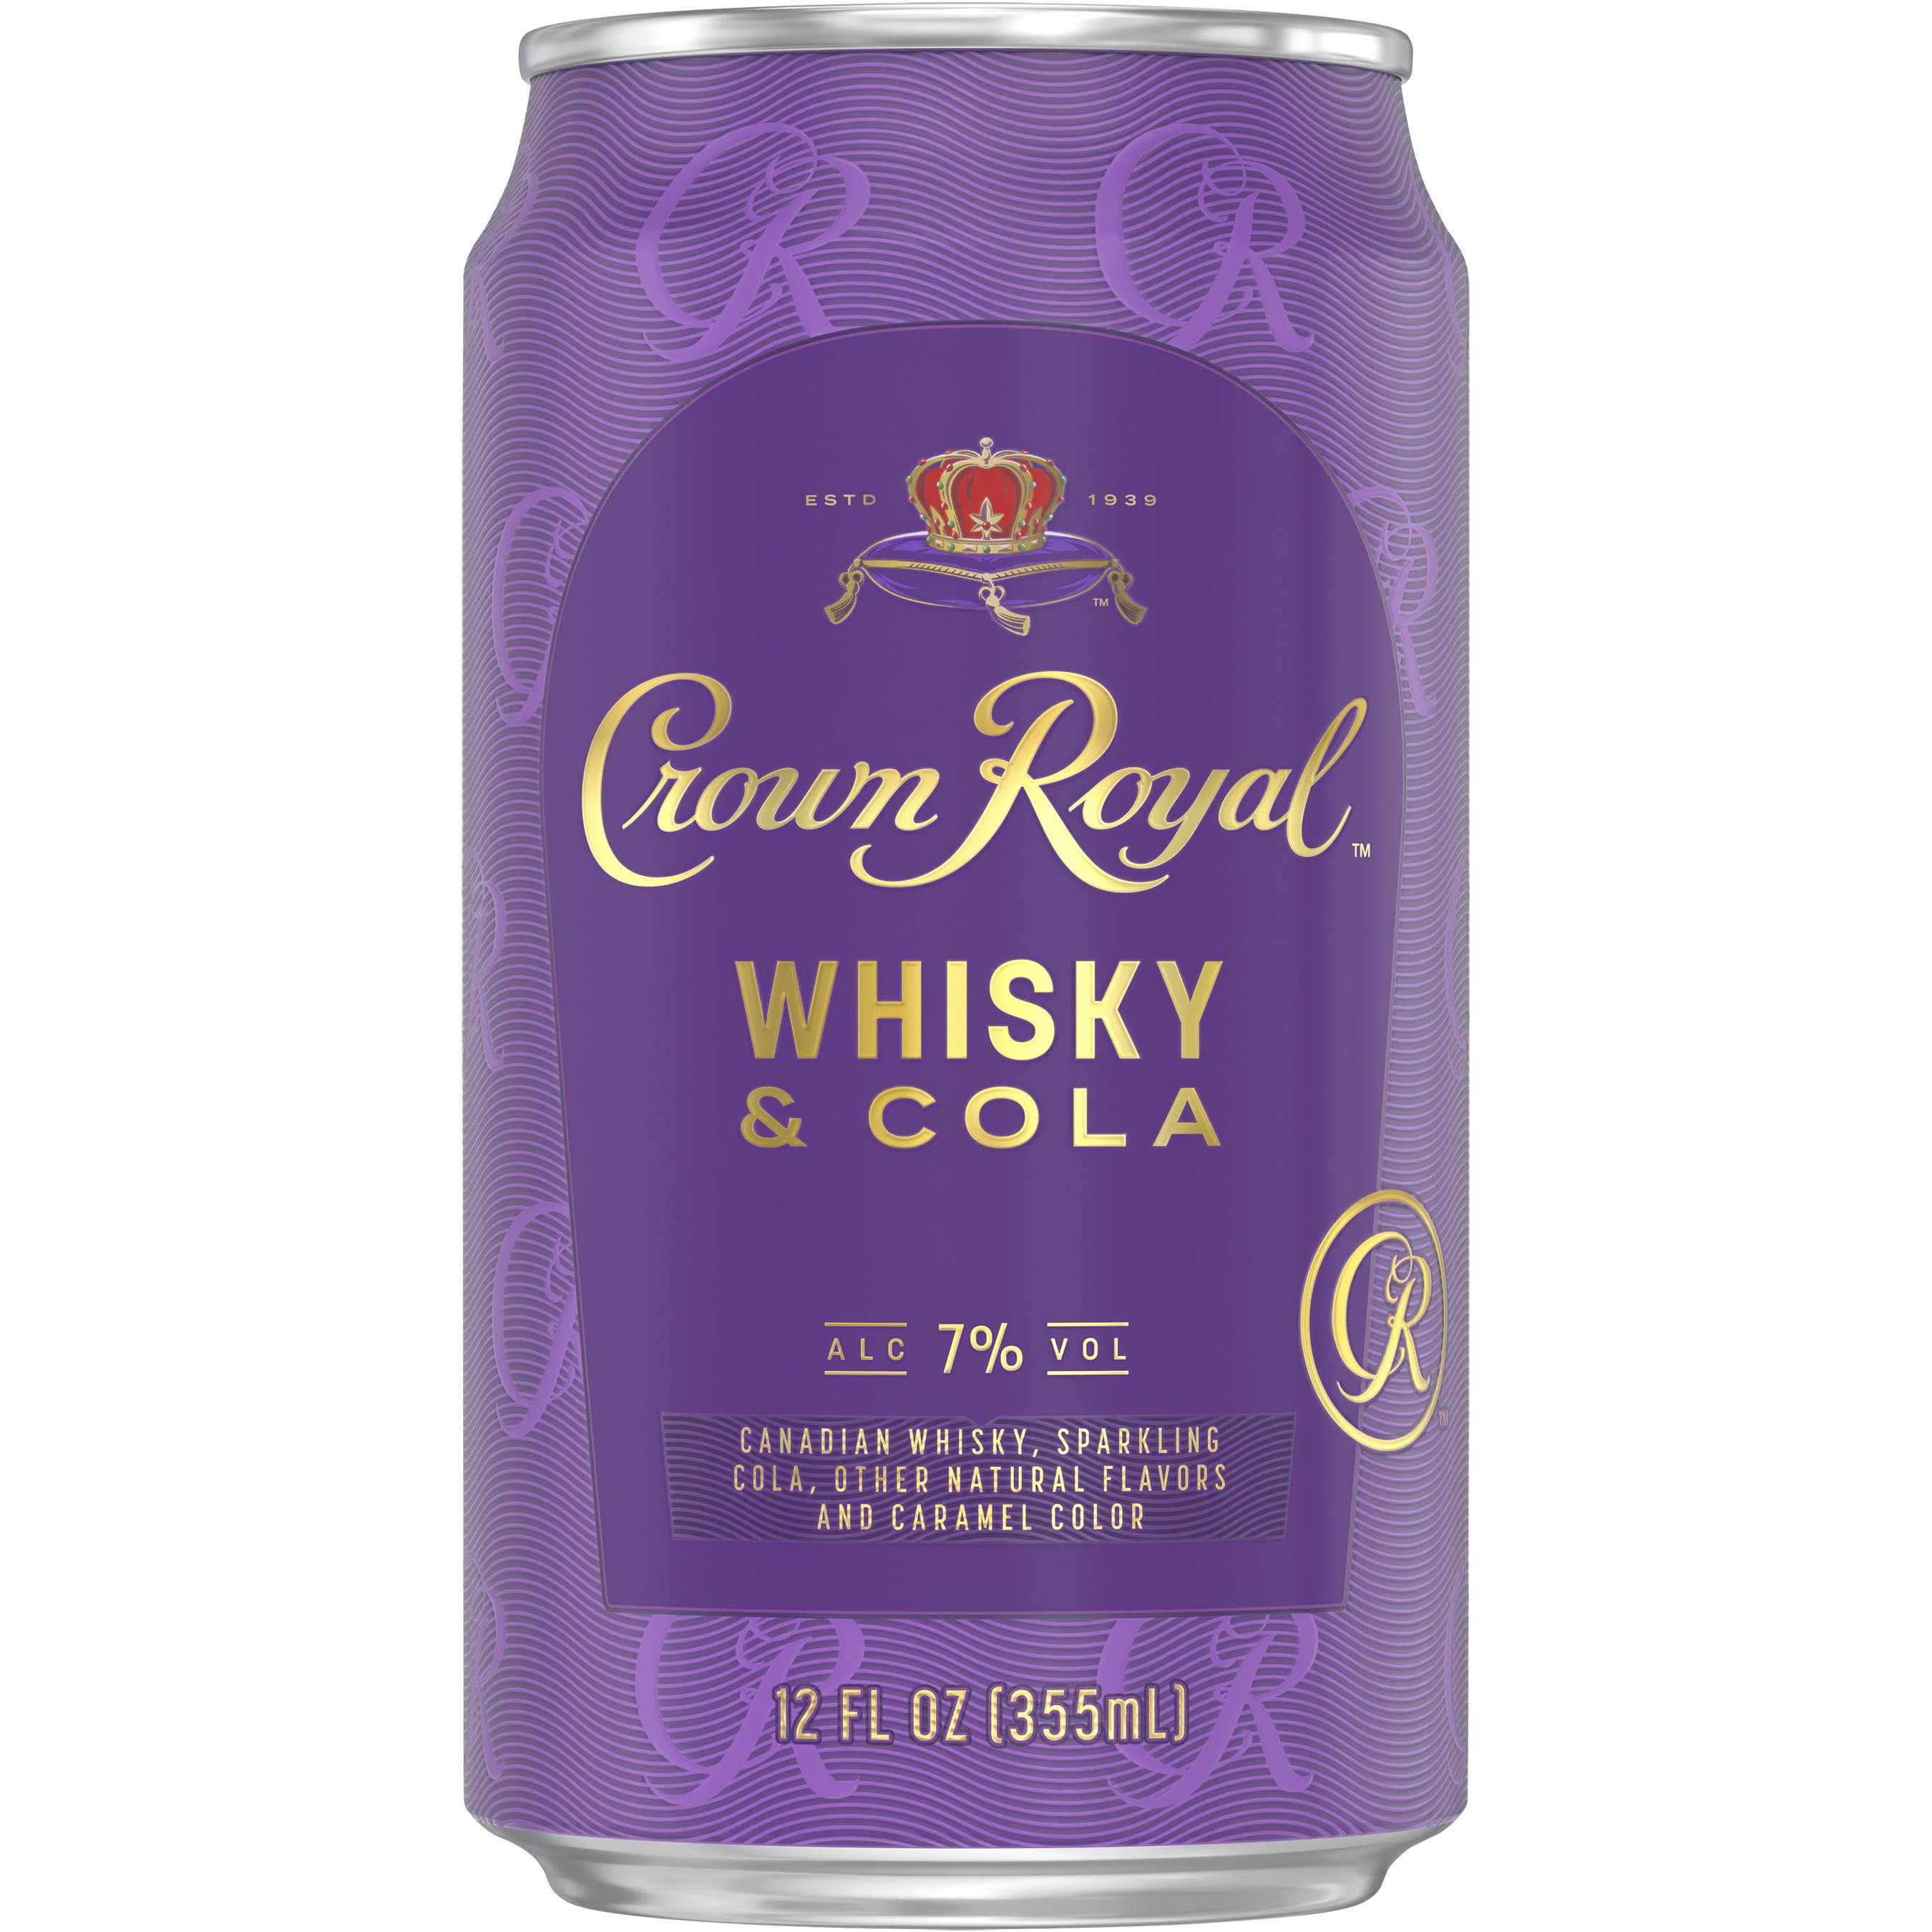 Crown Royal Whisky & Cola